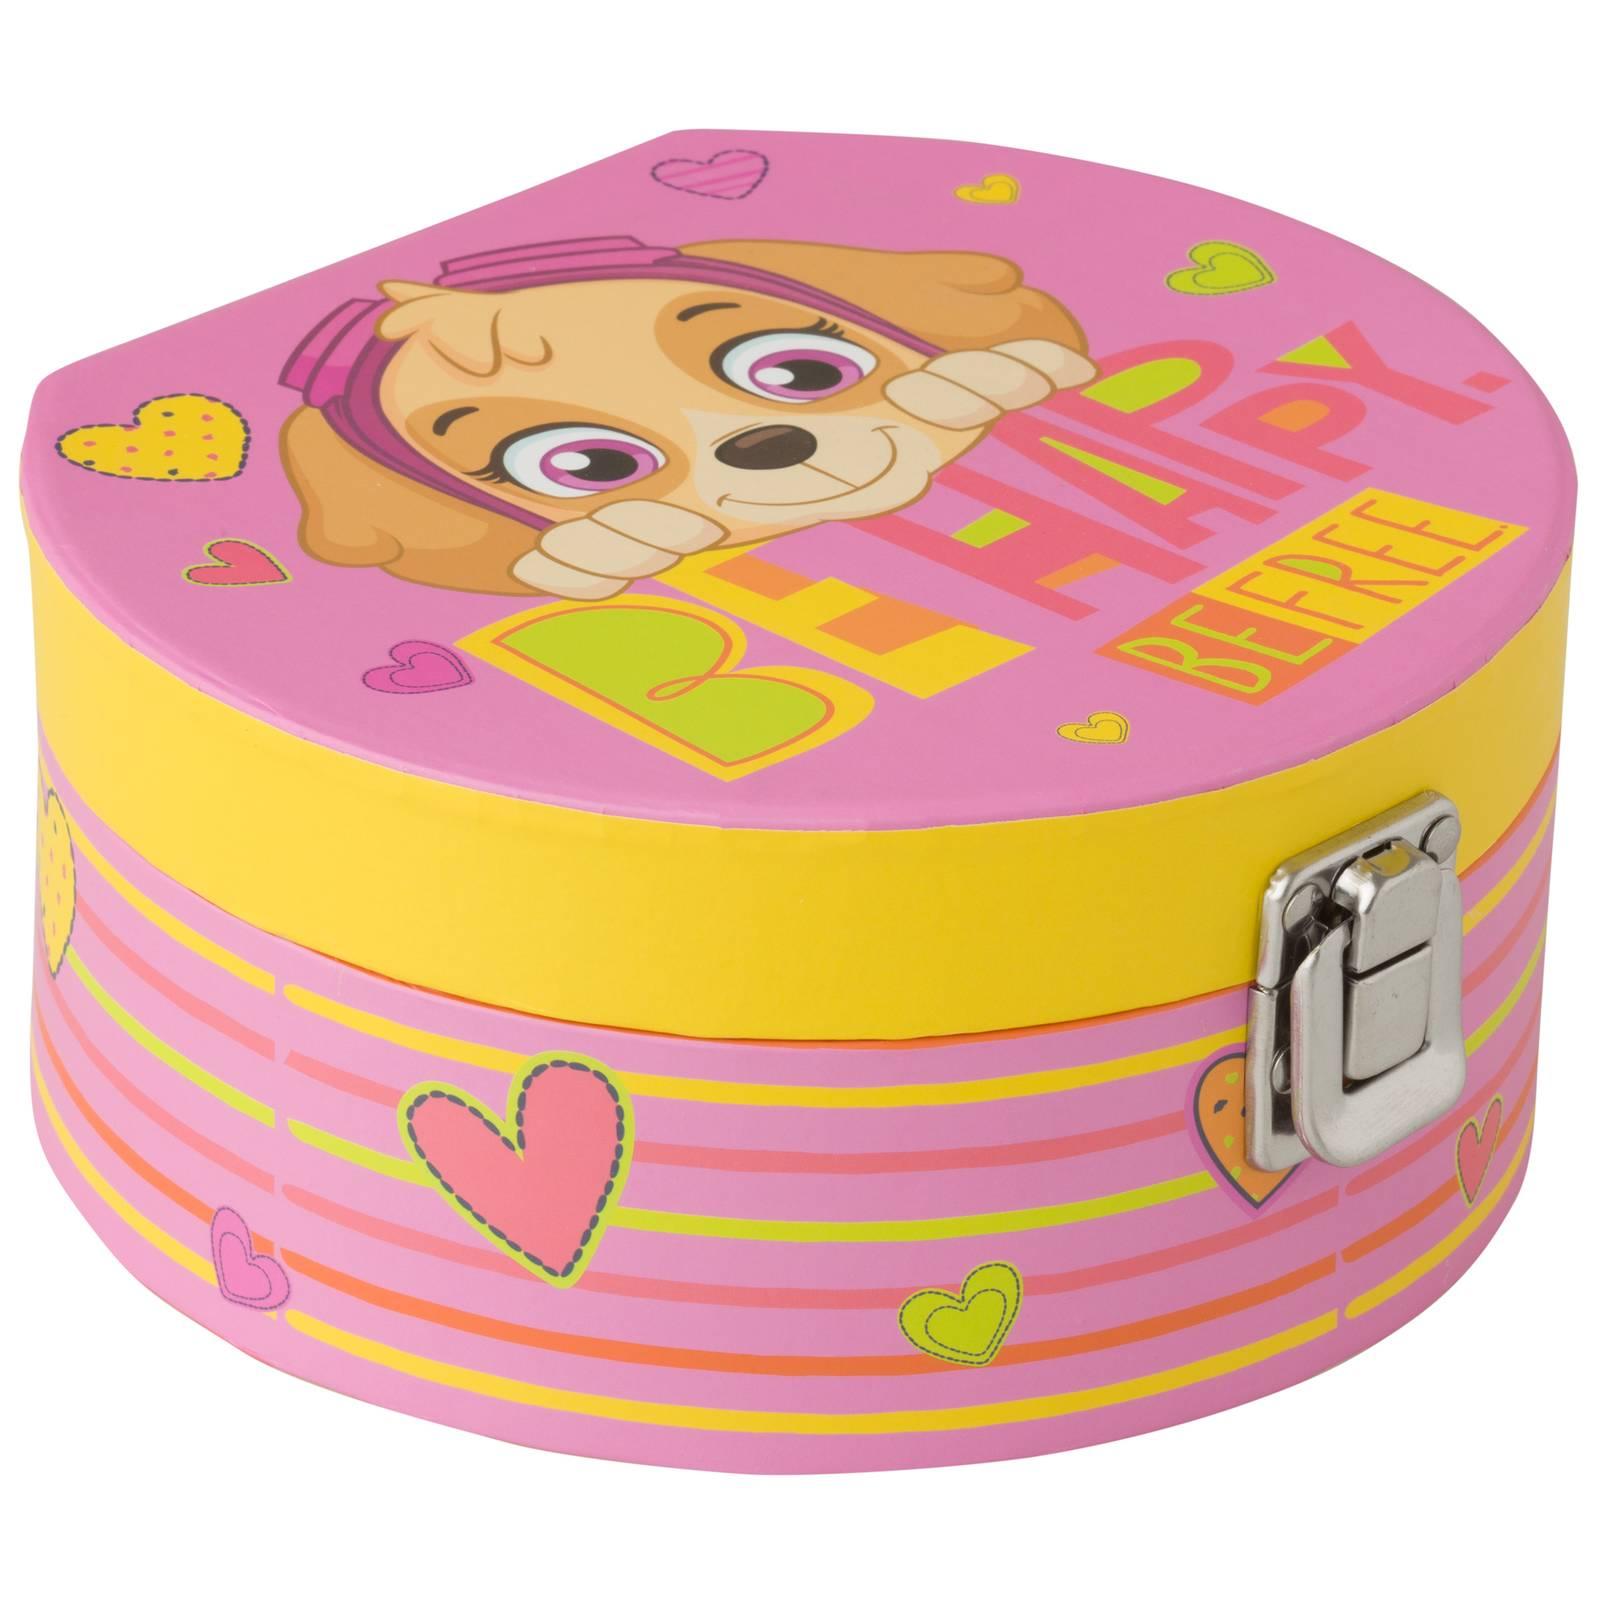 Pudełko z lusterkiem Psi Patrol Girls 17 x 15,5 x 8 cm NICKELODEON